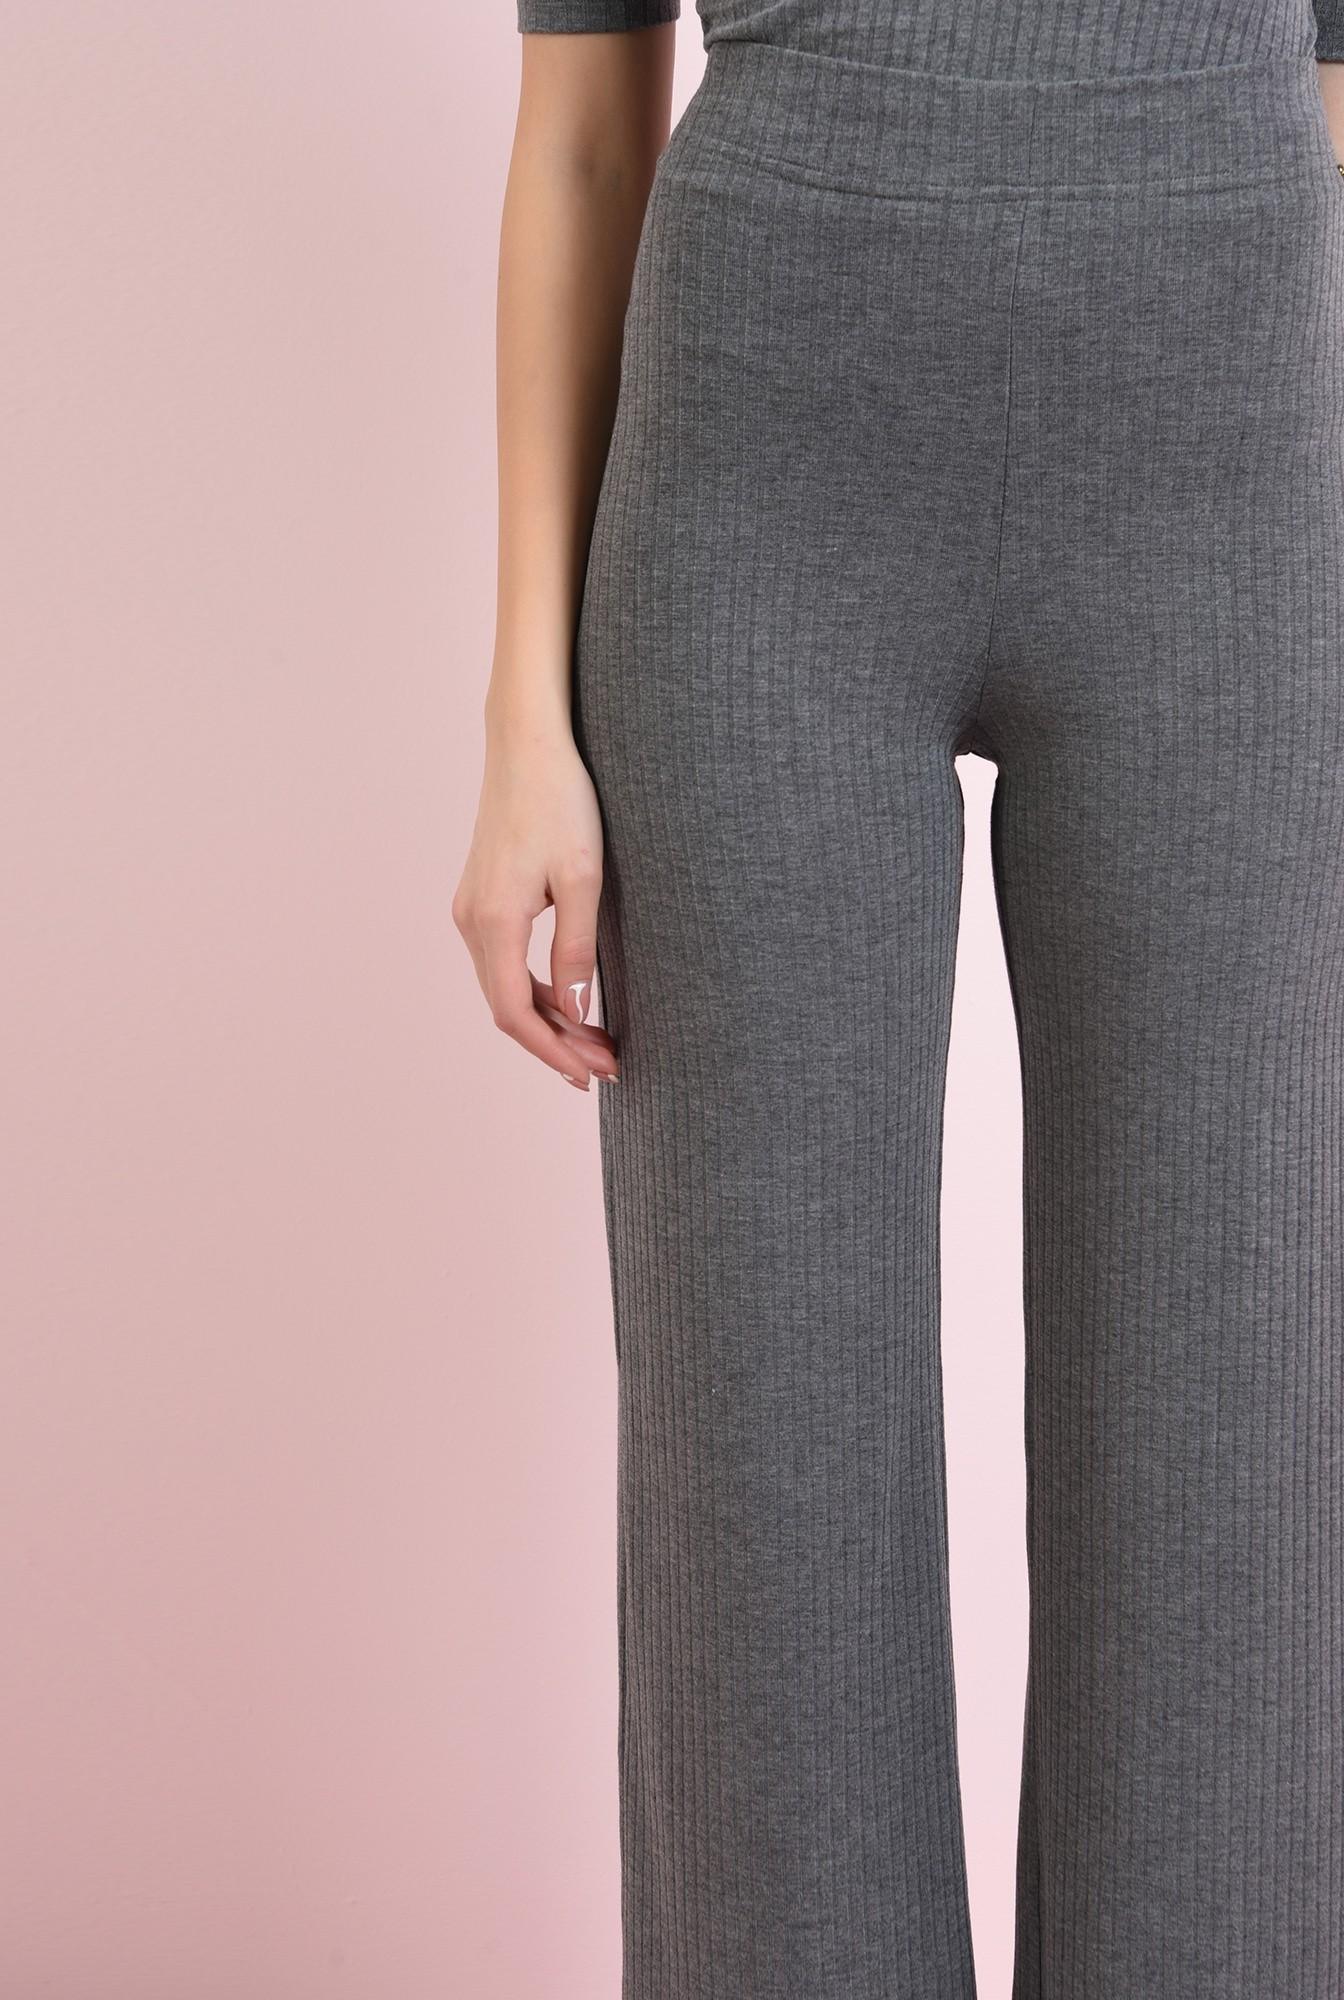 2 - pantaloni evazati, cullotes, cu talie inalta